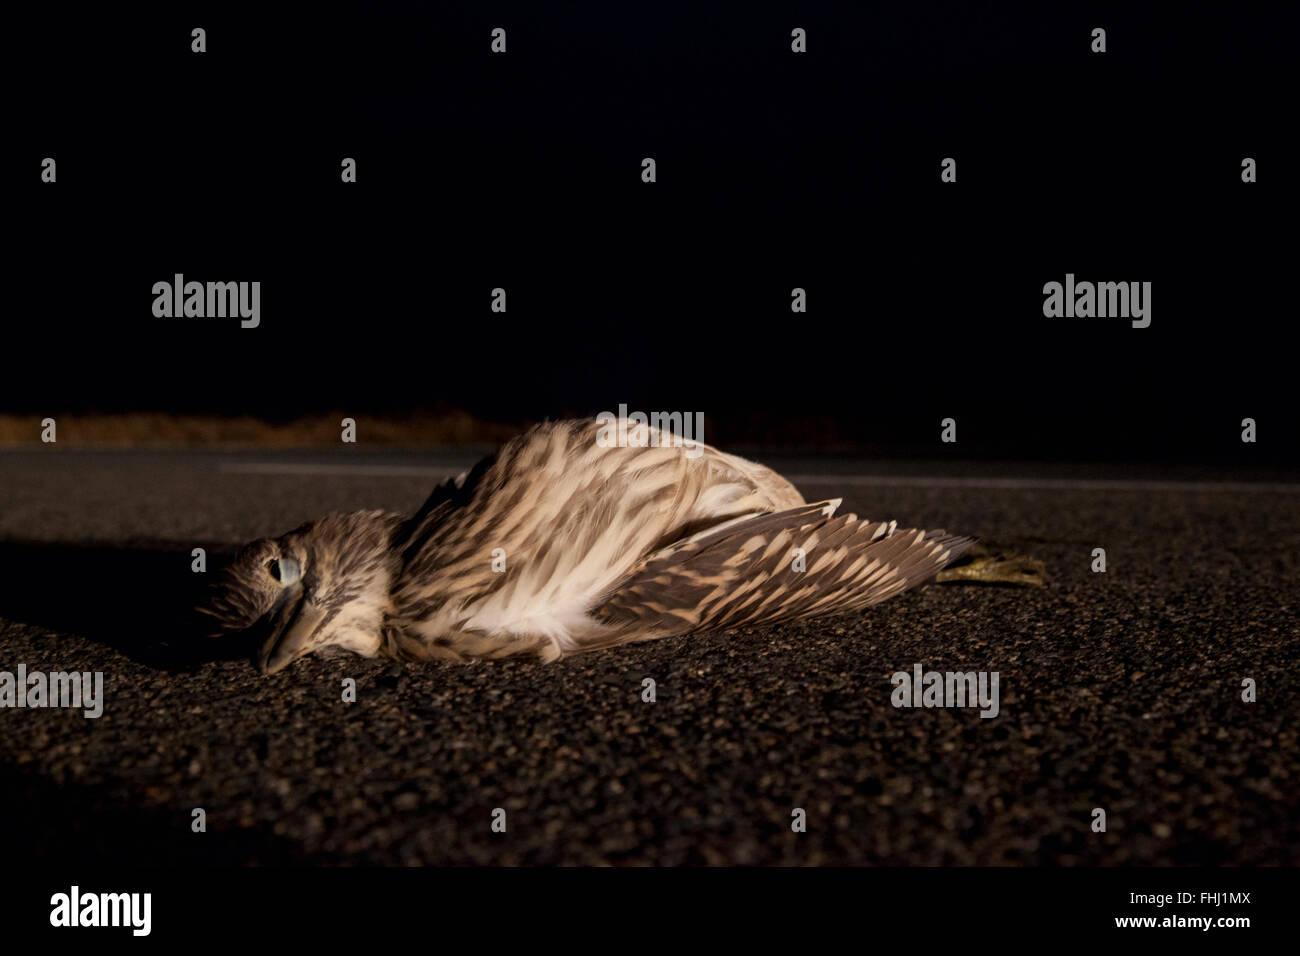 The Fukushima samurais -  Japan / Fukushima  -  'Before the birds and foxes would come to eat any animals ran - Stock Image